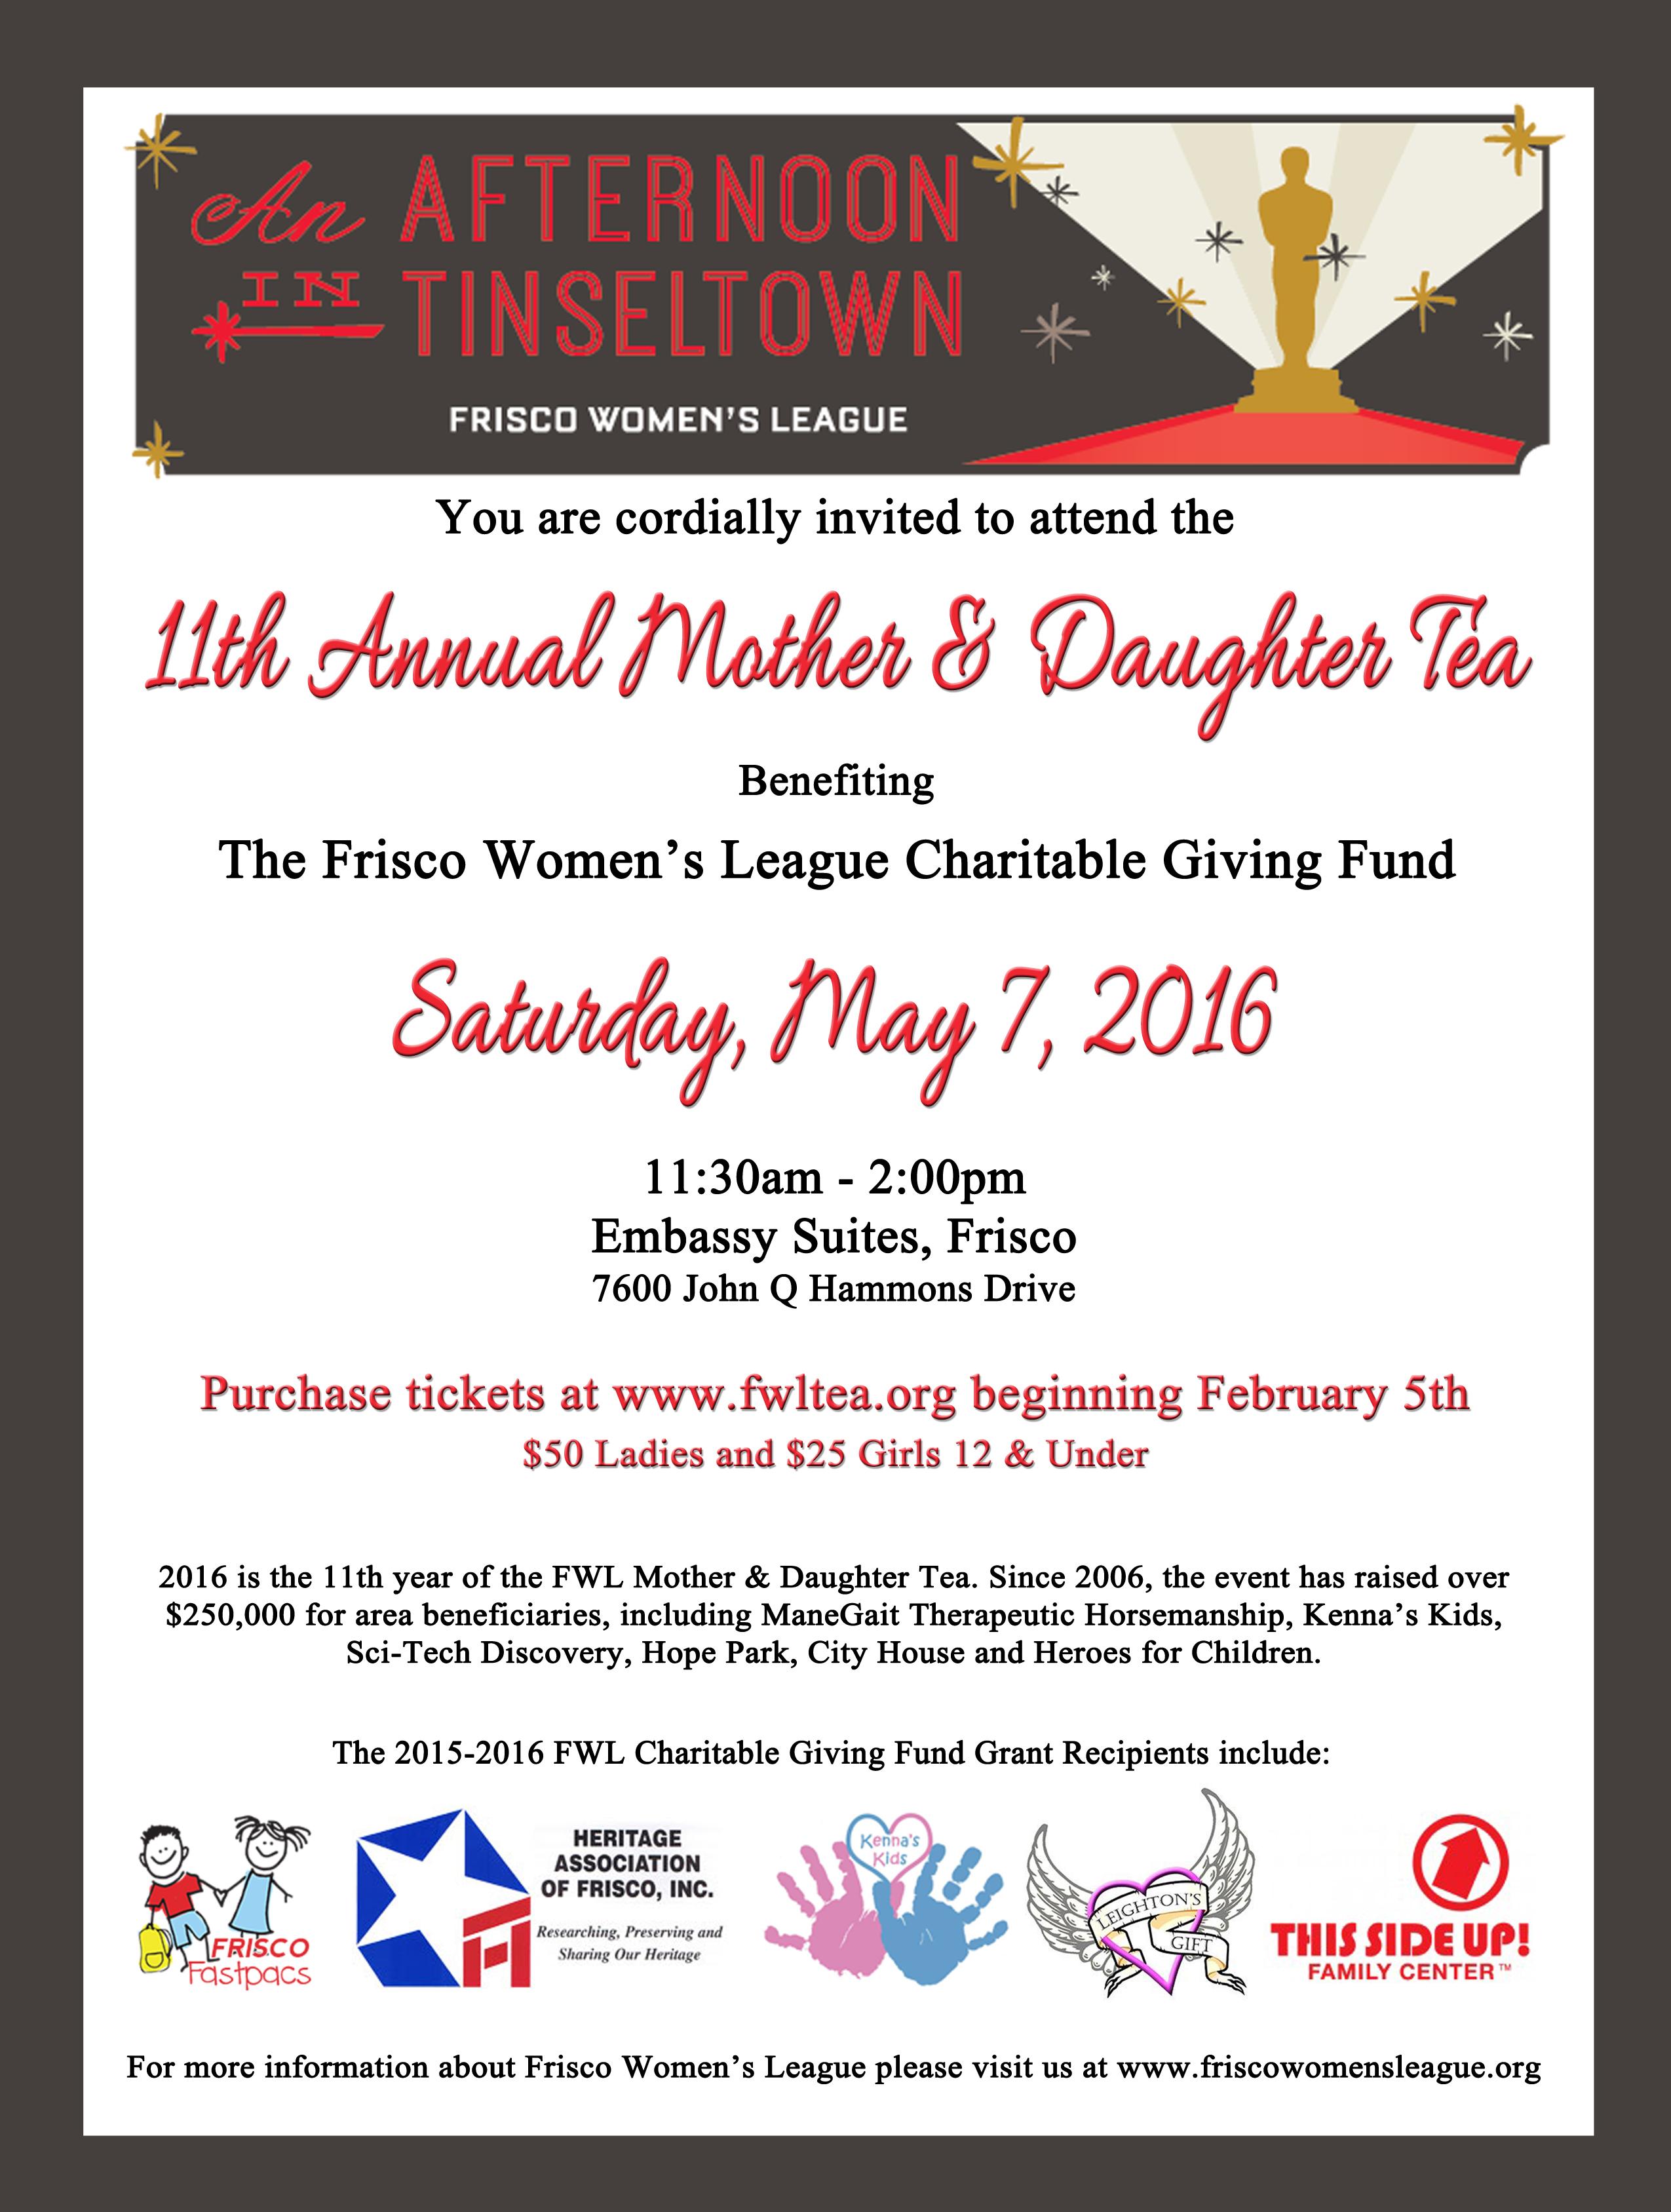 11th Annual FWL Mother Daughter Tea Frisco Womens League